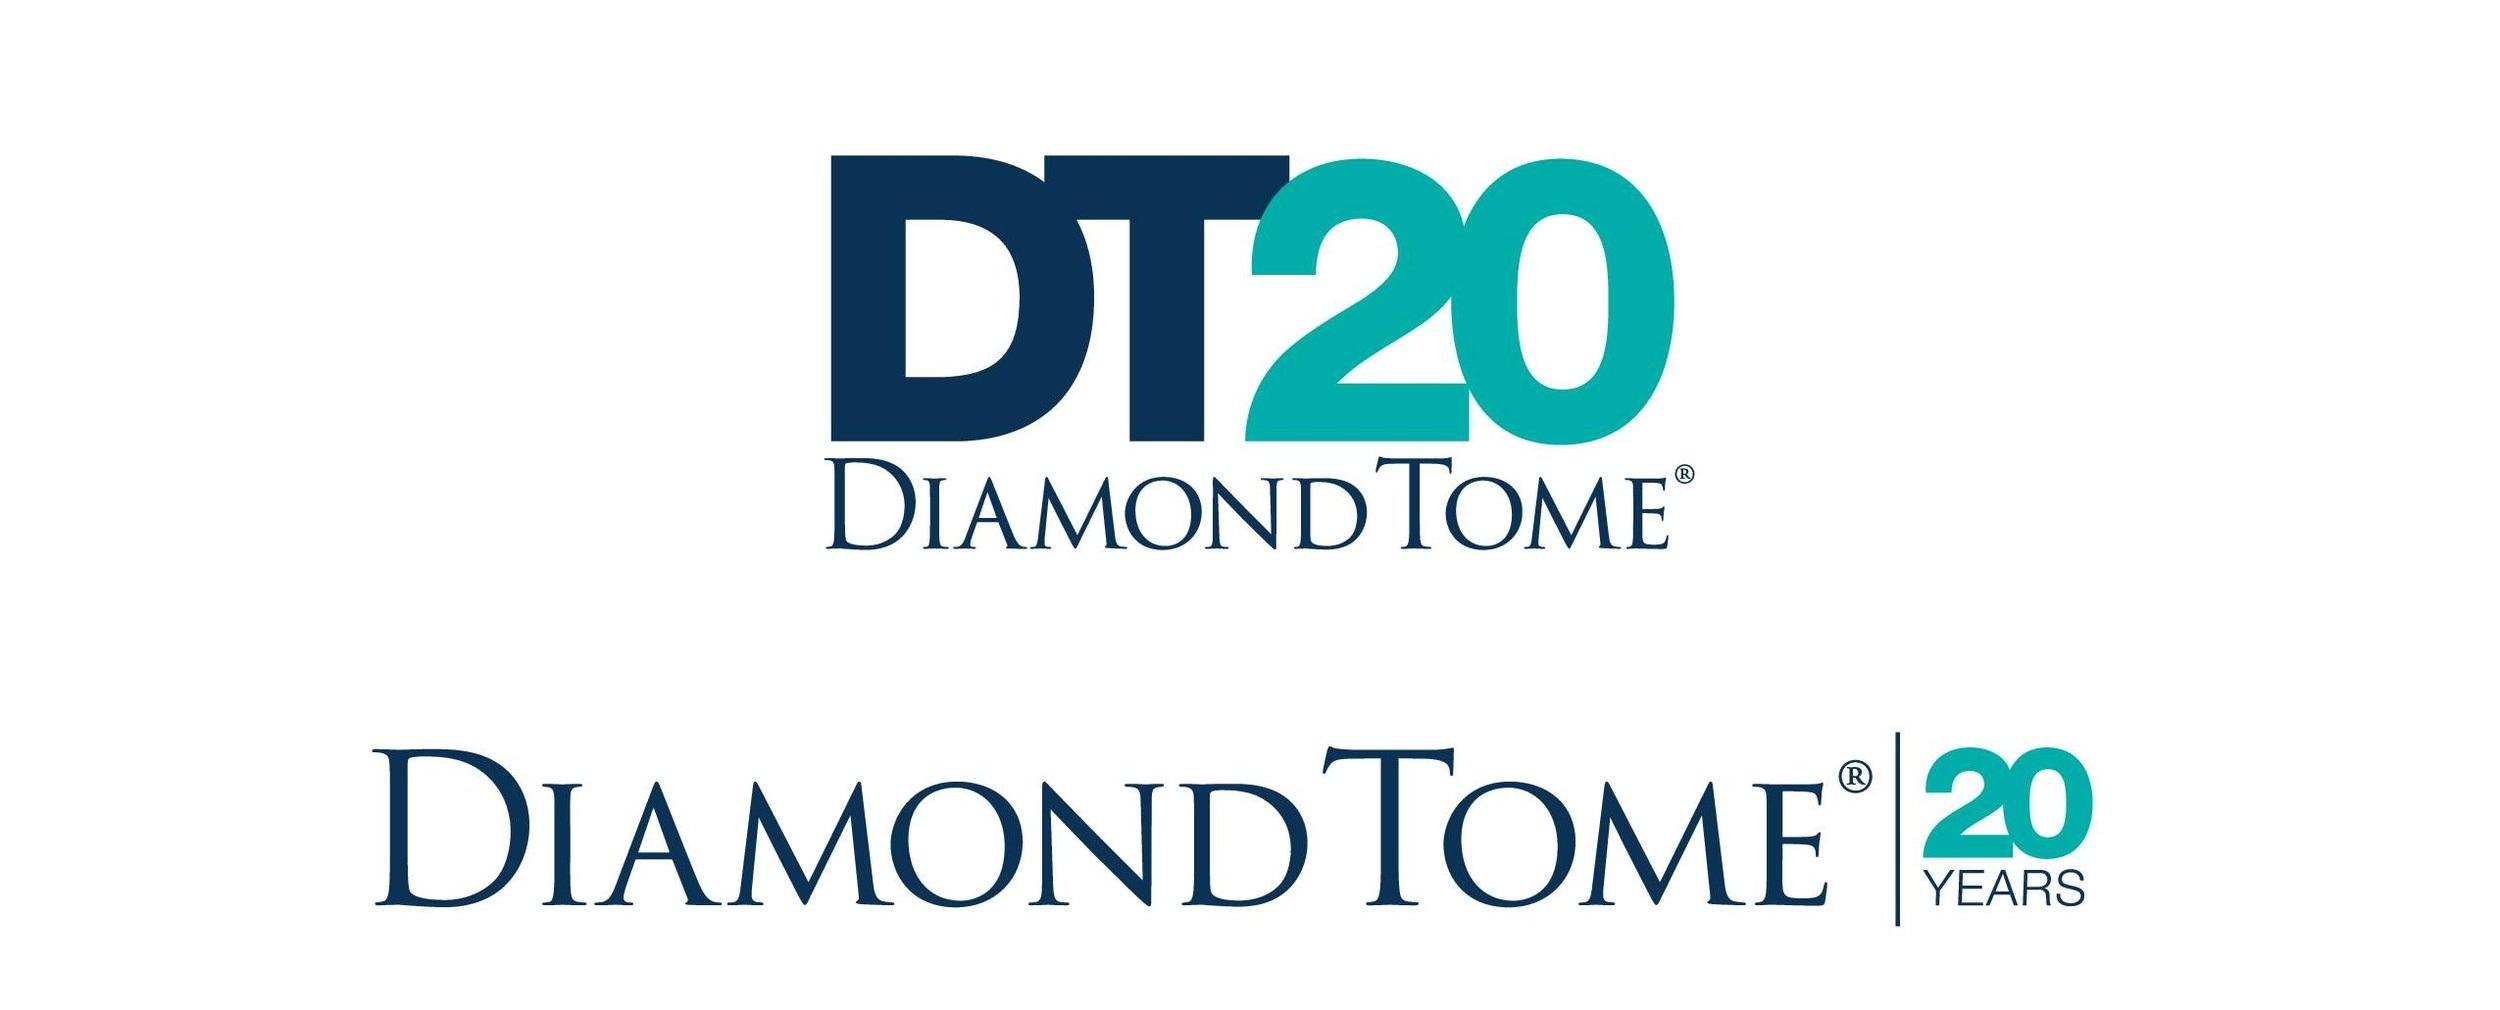 DT-20Year-Logo-0618-v3.jpg